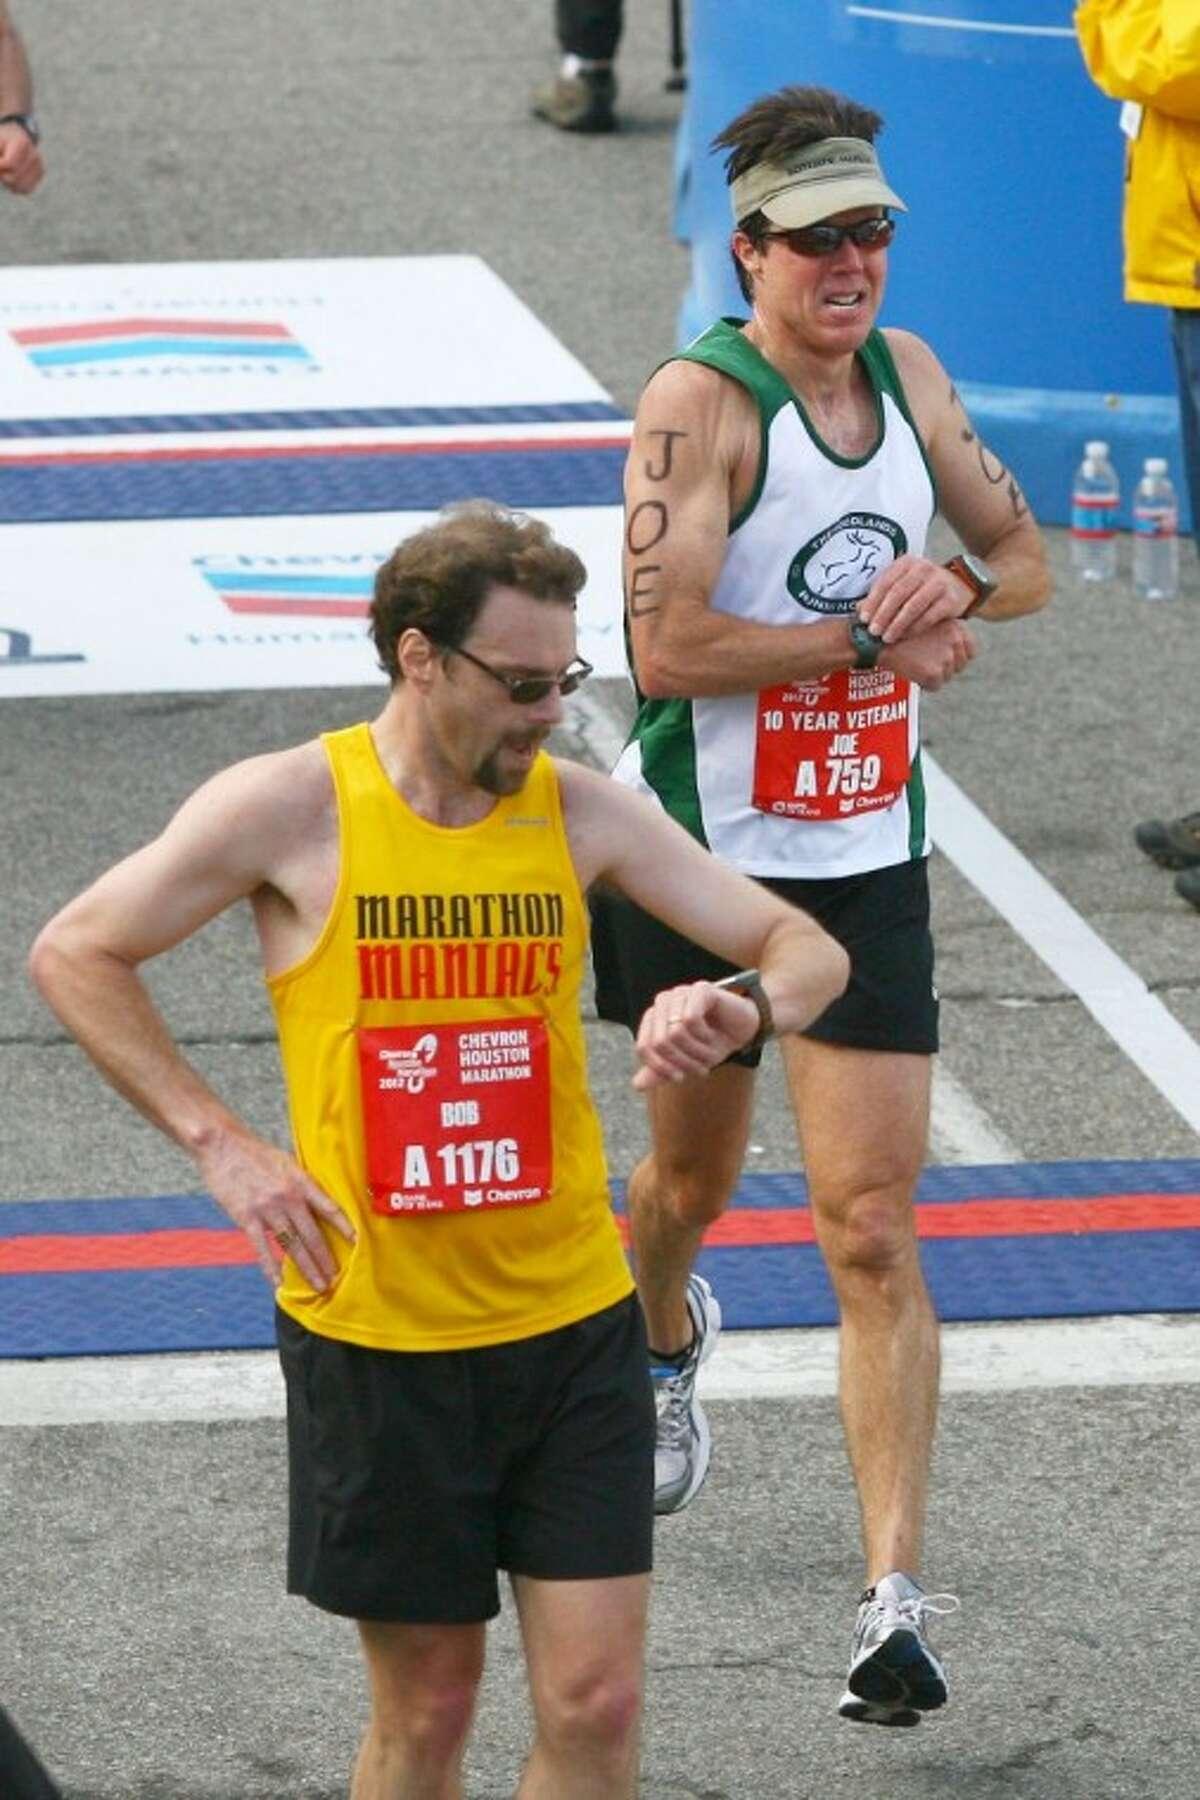 Joe Killeen, of The Woodlands, crosses the finish line Sunday at the Chevron Houston Marathon in Houston.